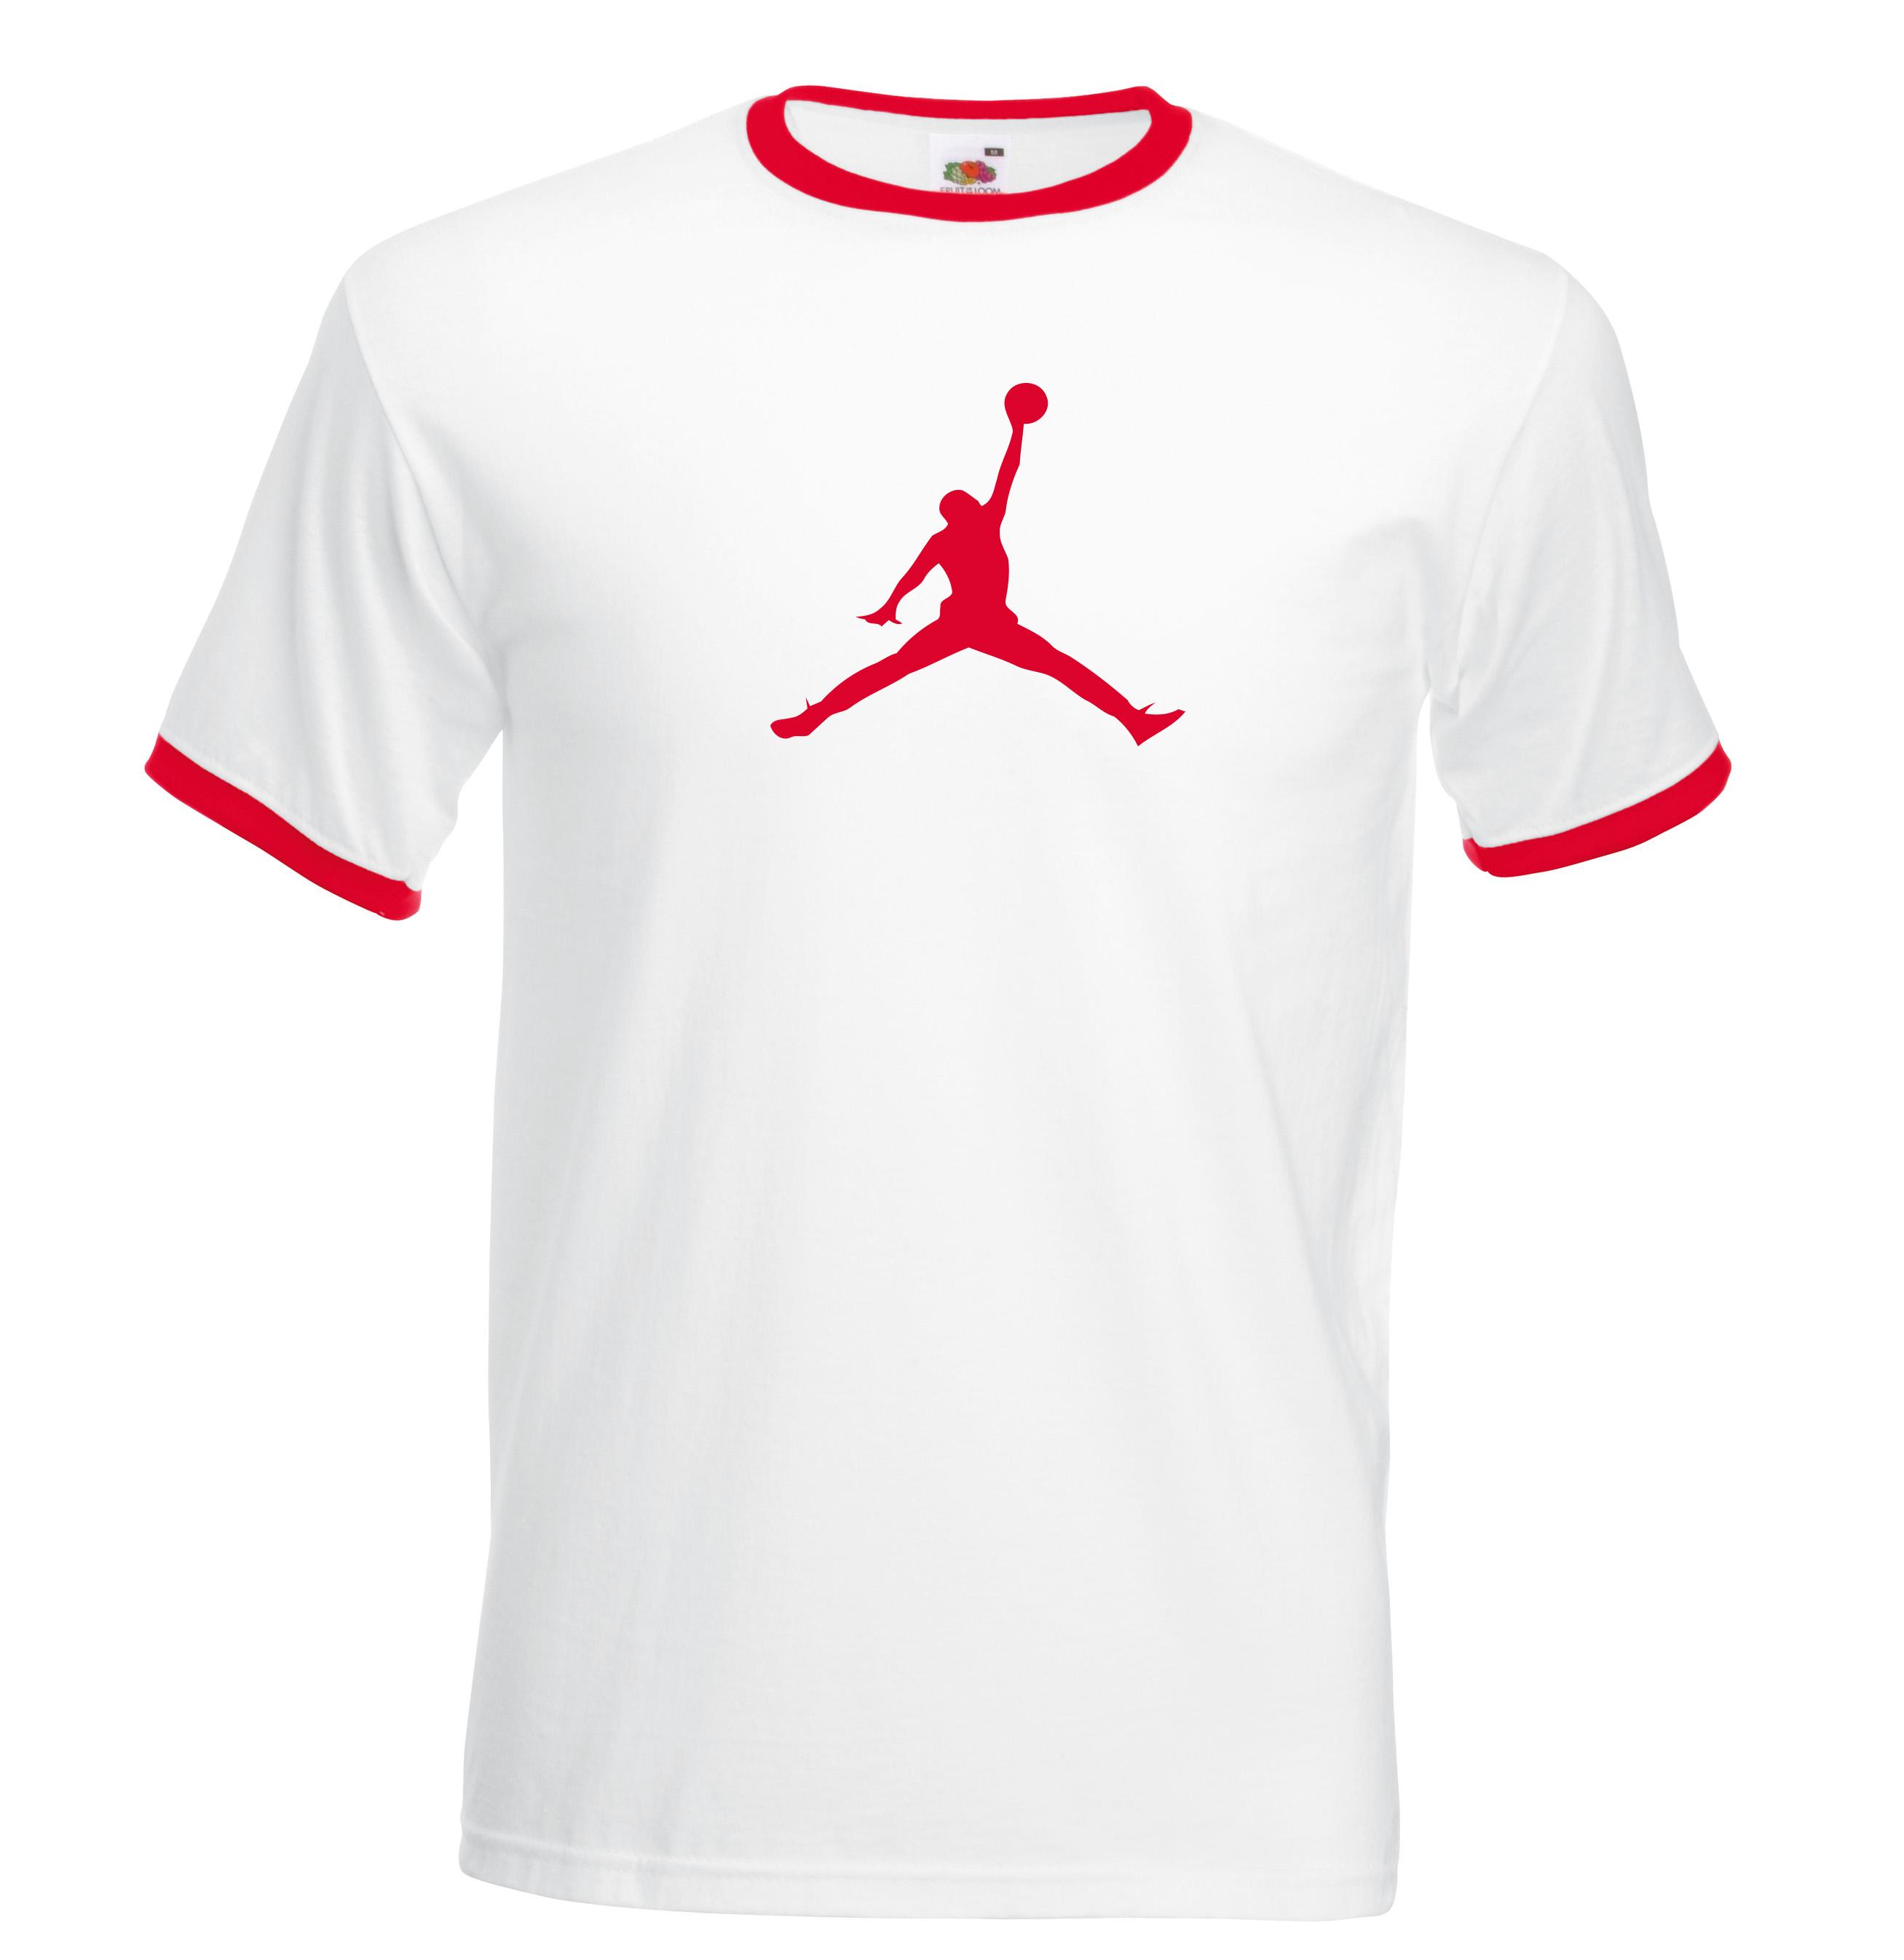 b62f3bd23ffbae Juko Jordan Ringer T Shirt Basketball Michael Bulls air nba unisex. ebay  custom template. ebay custom template. ebay custom template